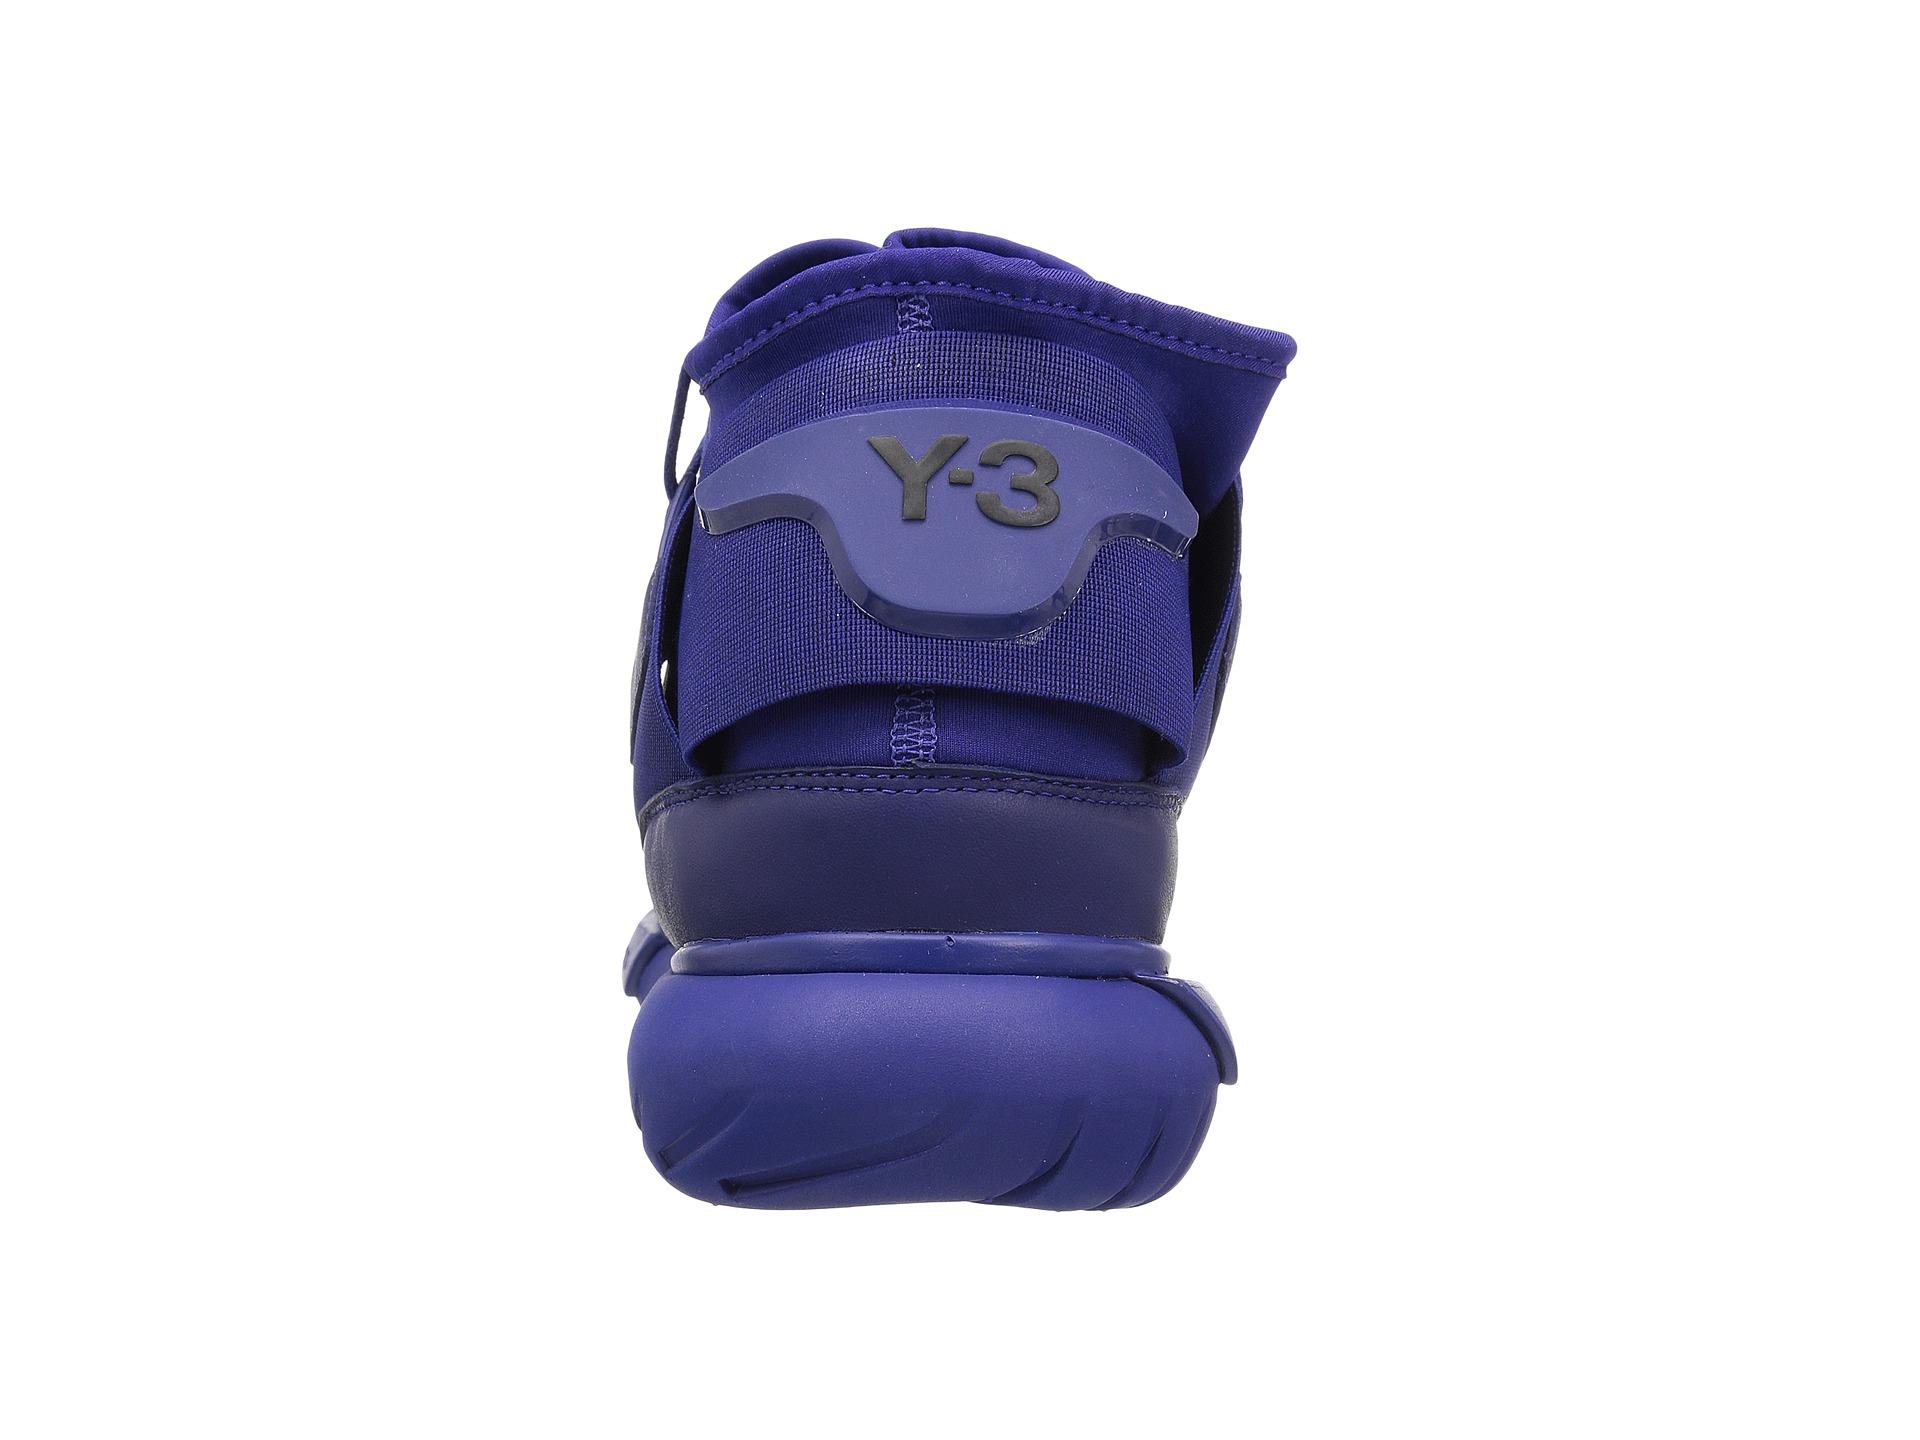 New adidas Y-3 Range Dropping Soon Sneaker Freaker